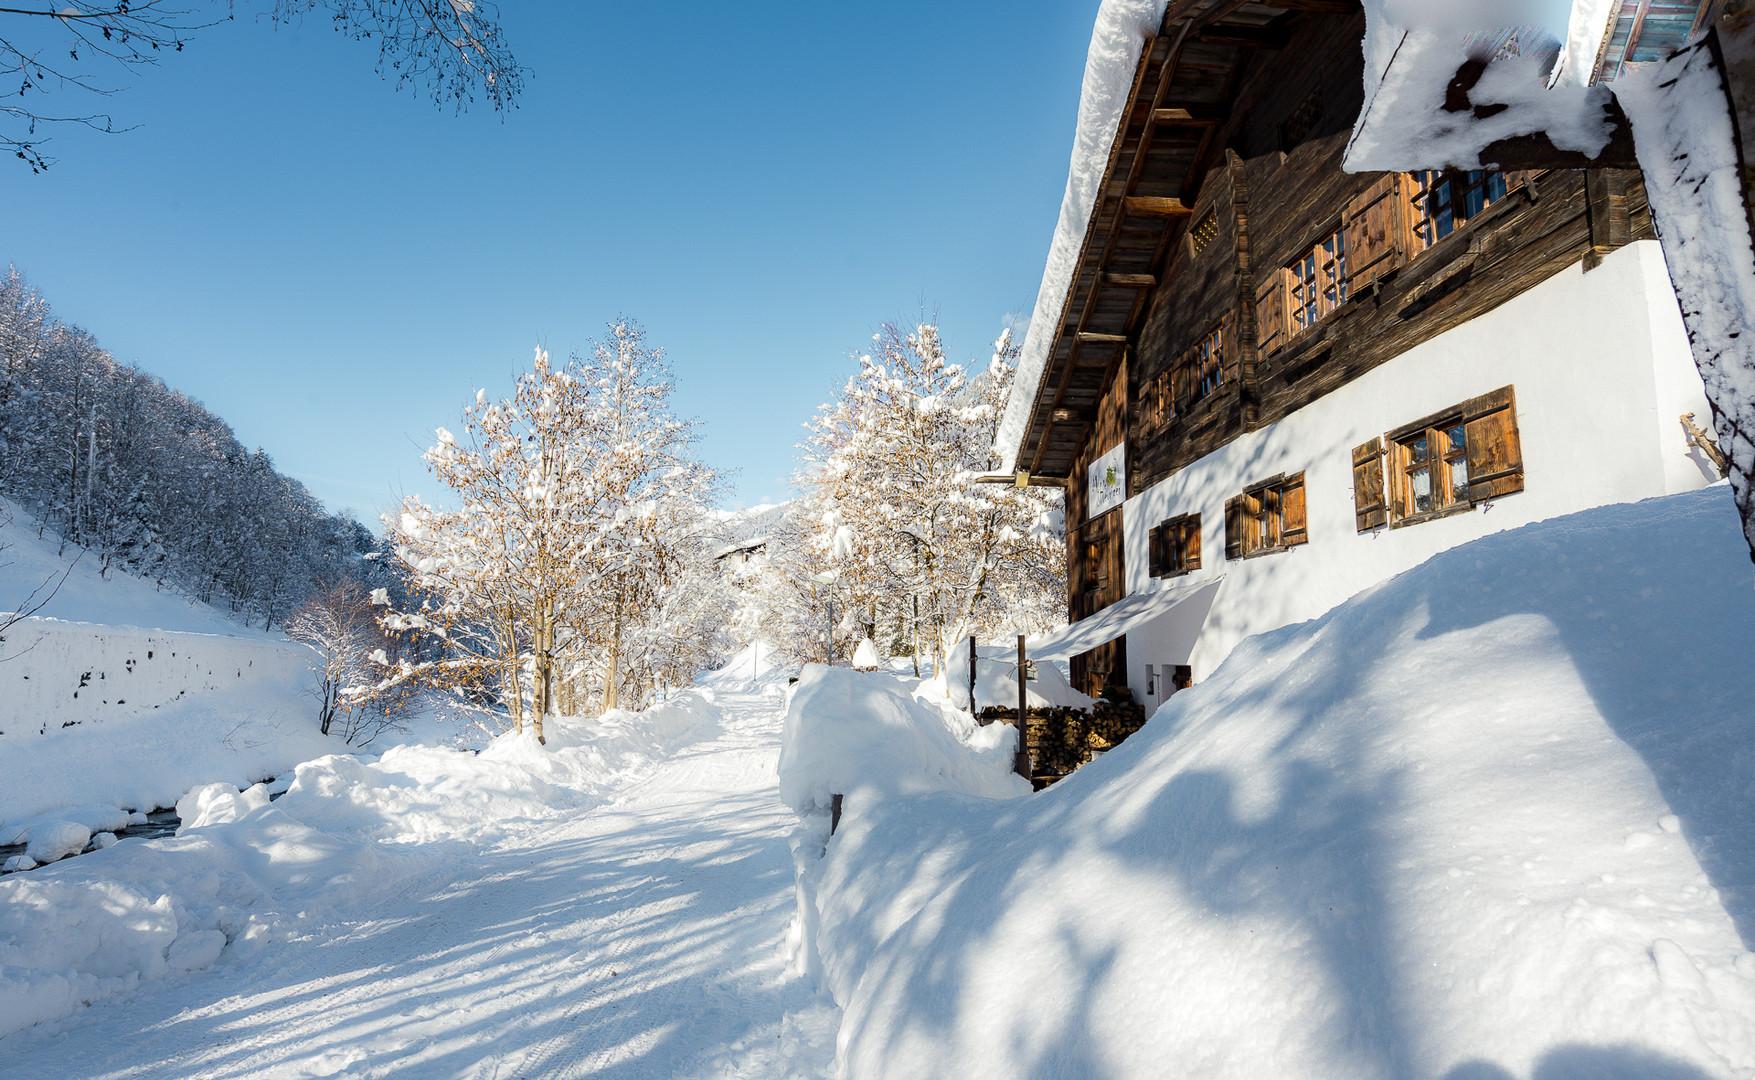 Mühle Winter-Langlaufloipe.jpg